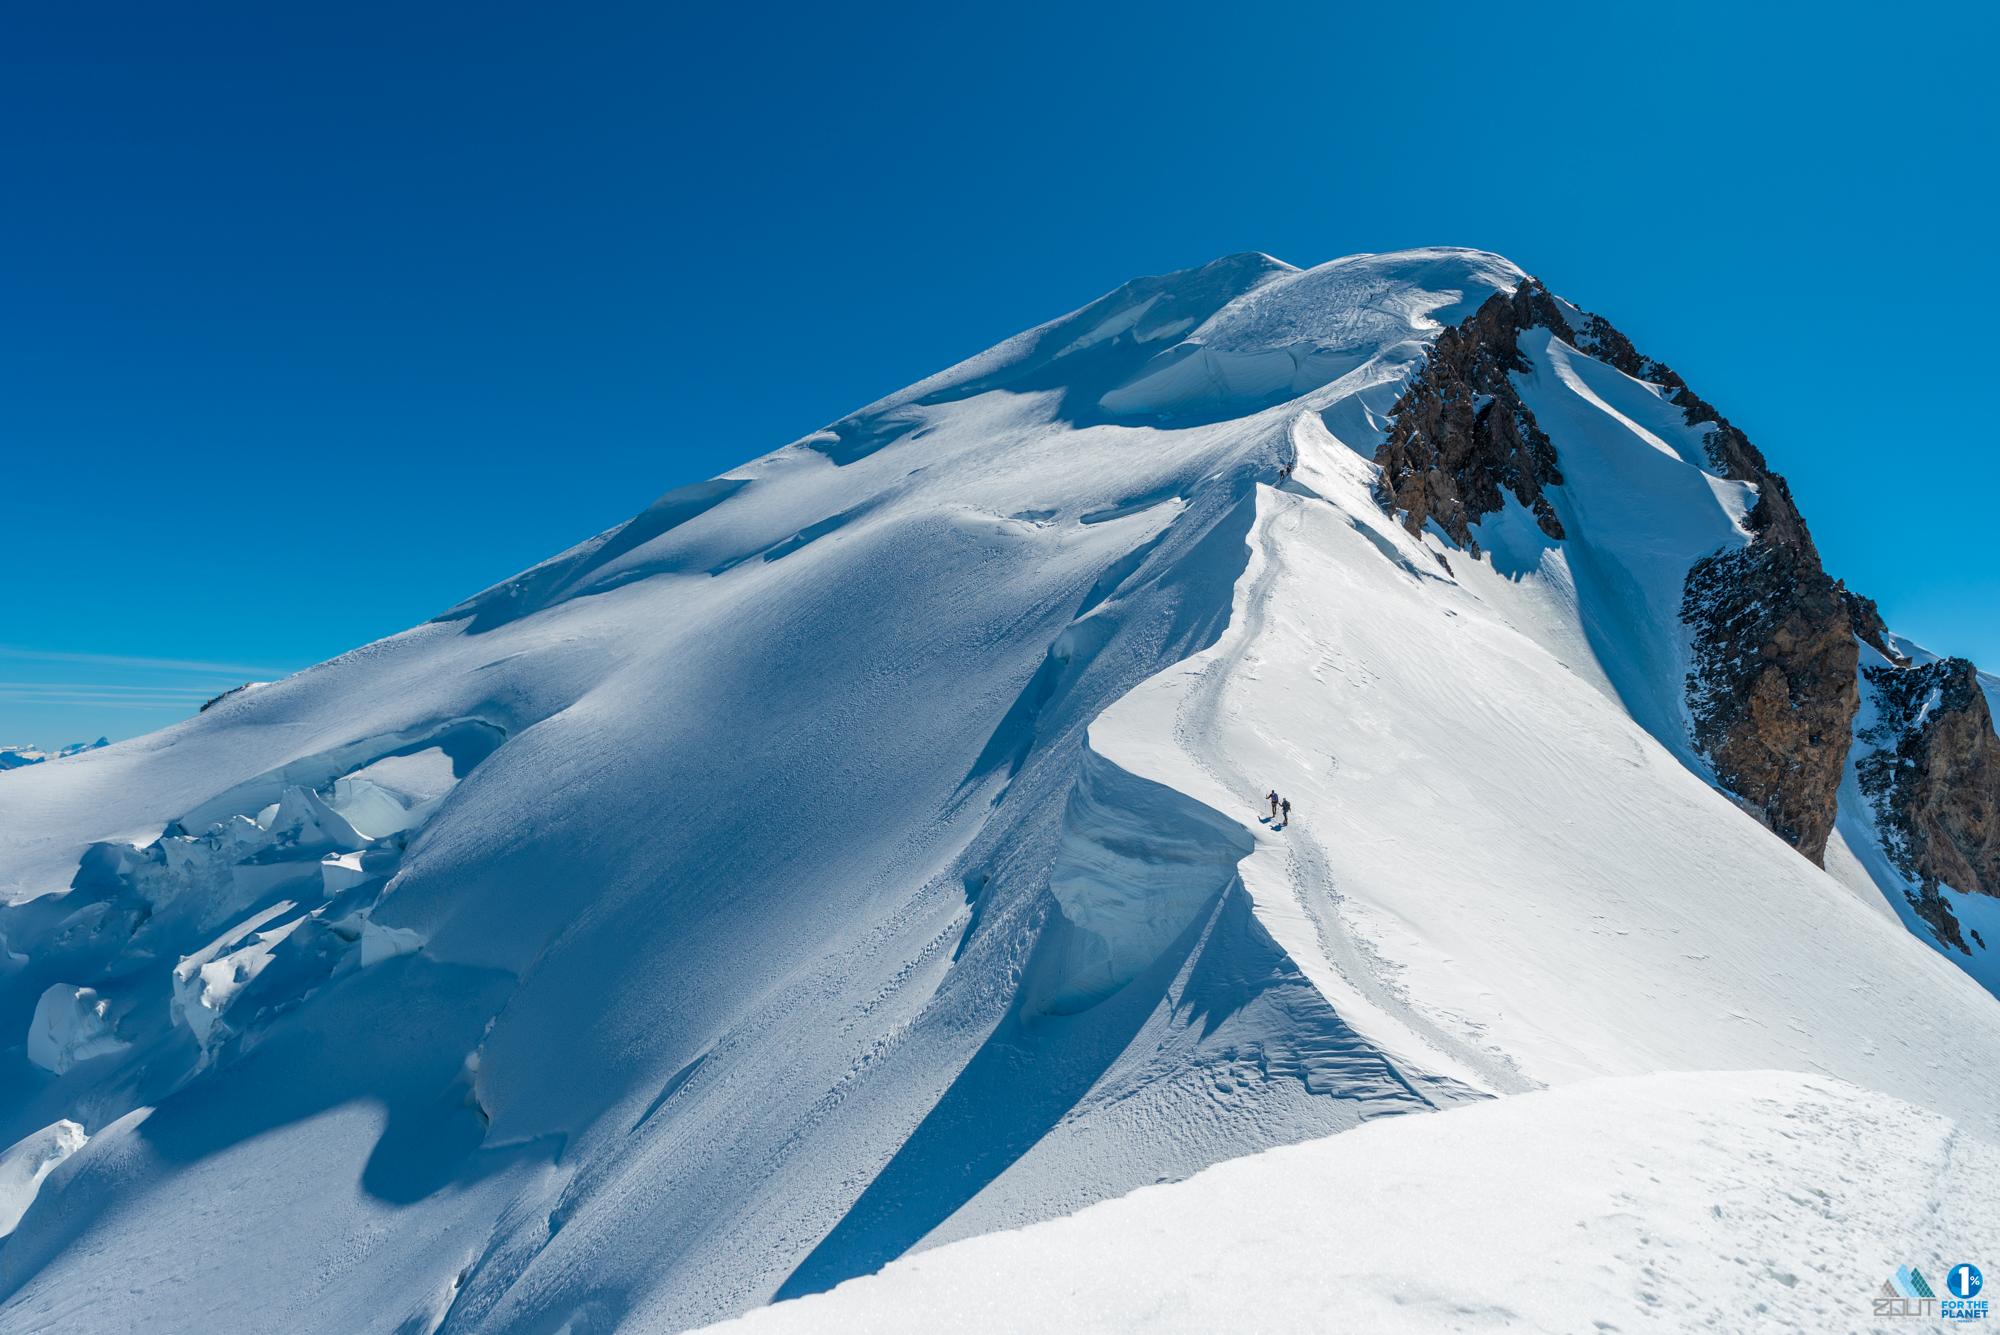 Beklimming Mt Blanc Normaal Route